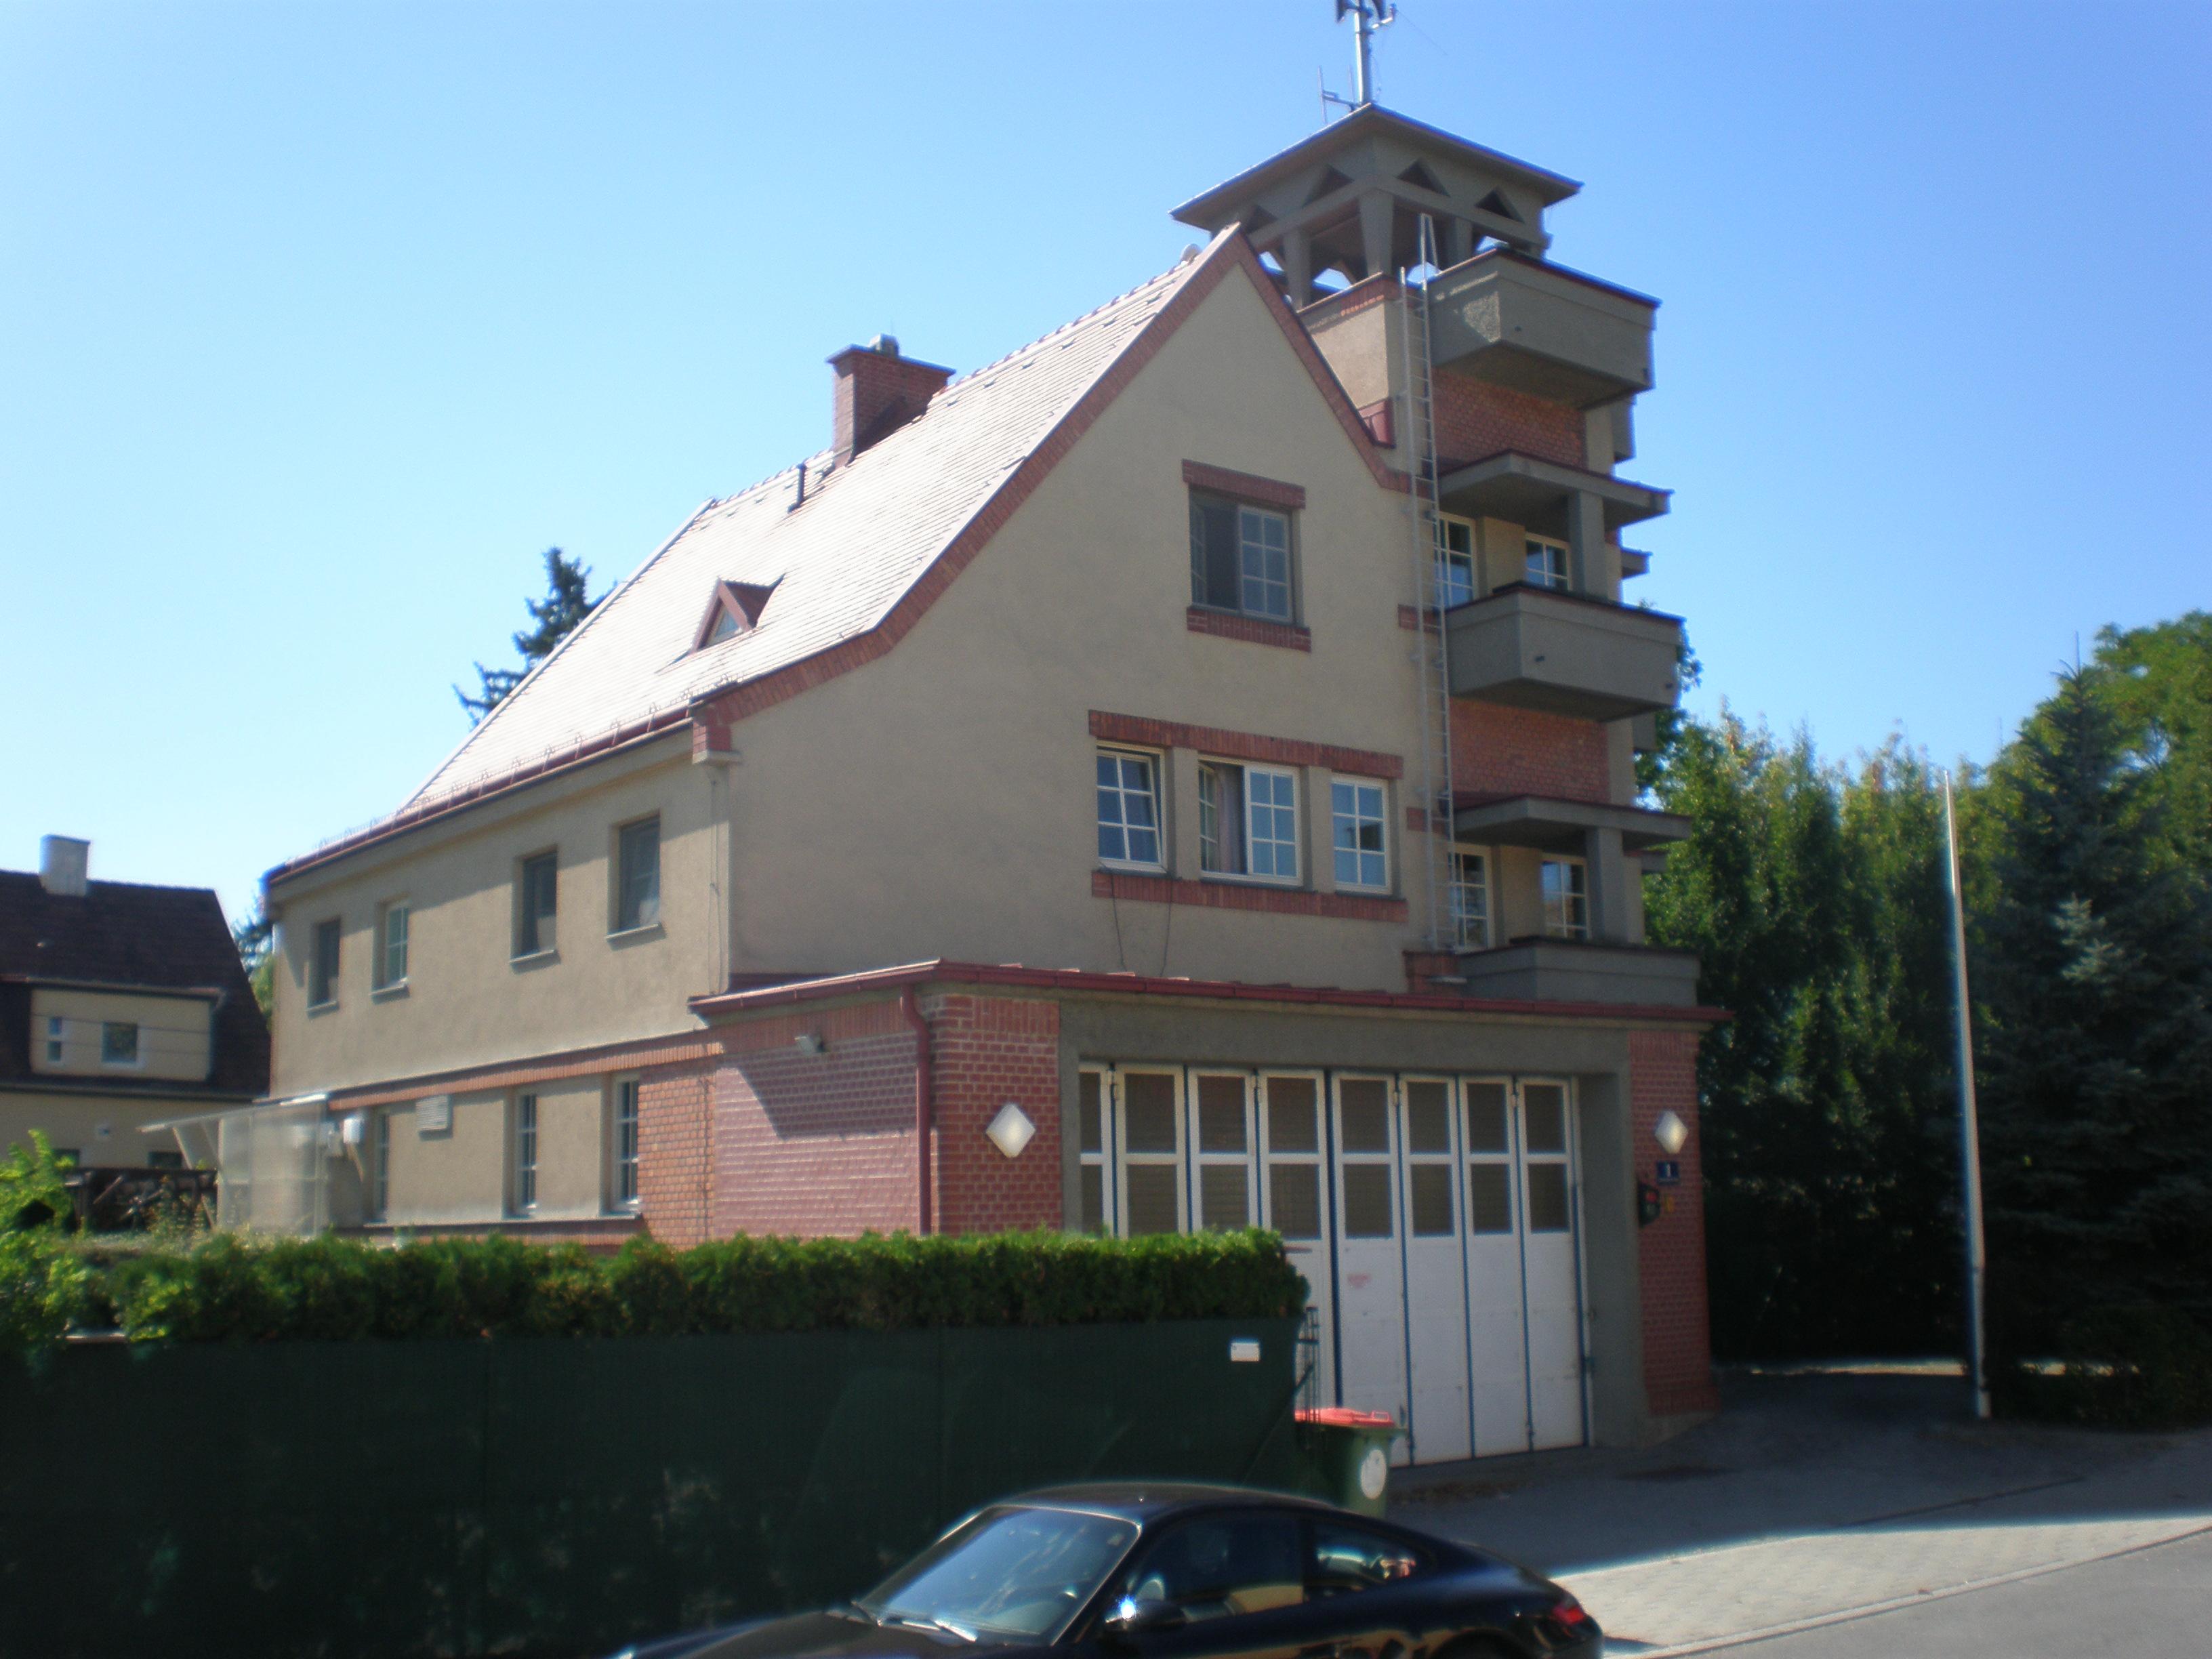 Feuerwache strebersdorf.JPG